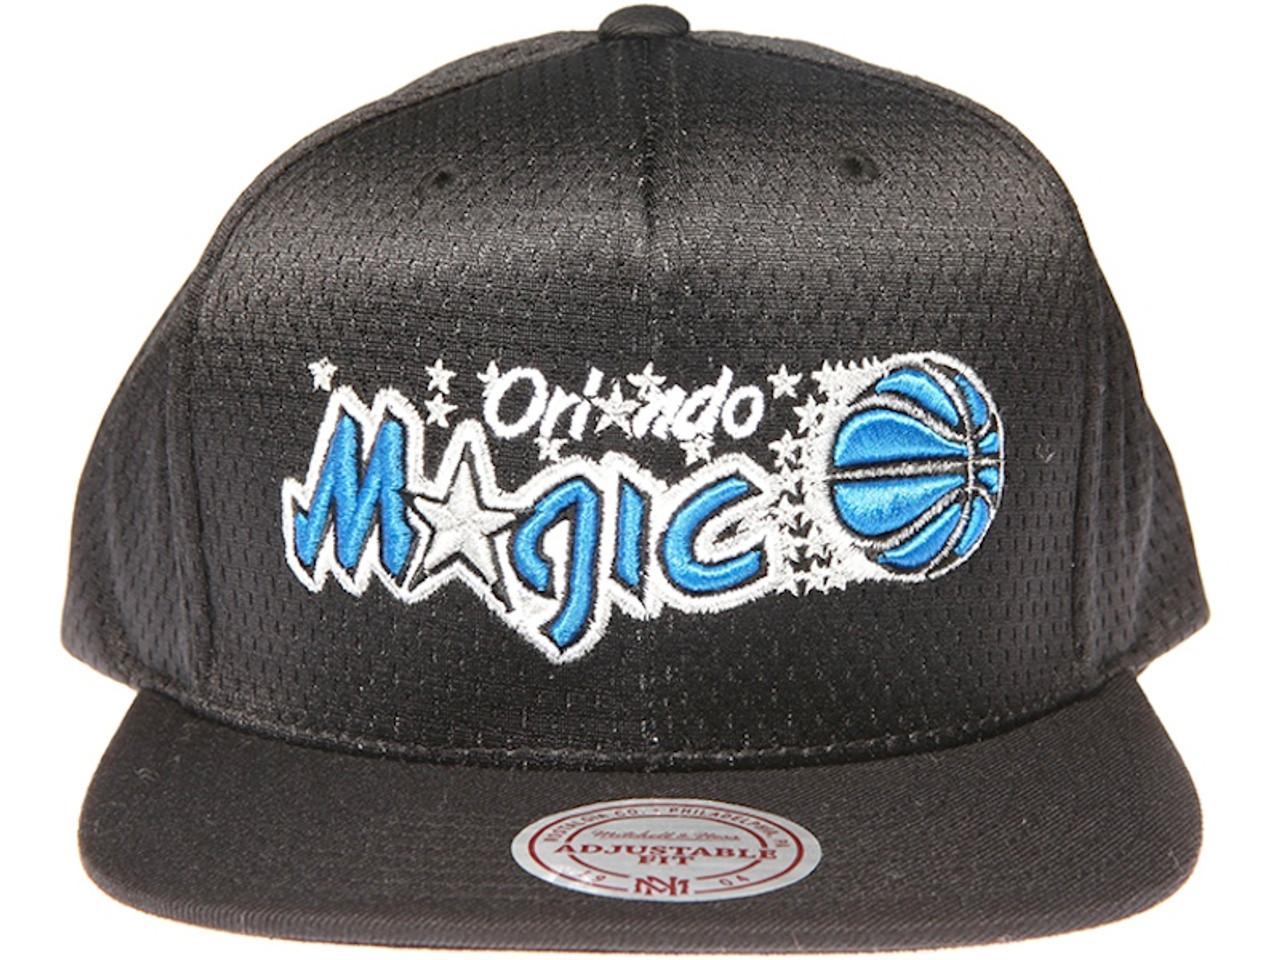 premium selection 575be df848 ... where to buy orlando magic logo mitchell ness nba black mesh snapback  hat 8de9c 0a963